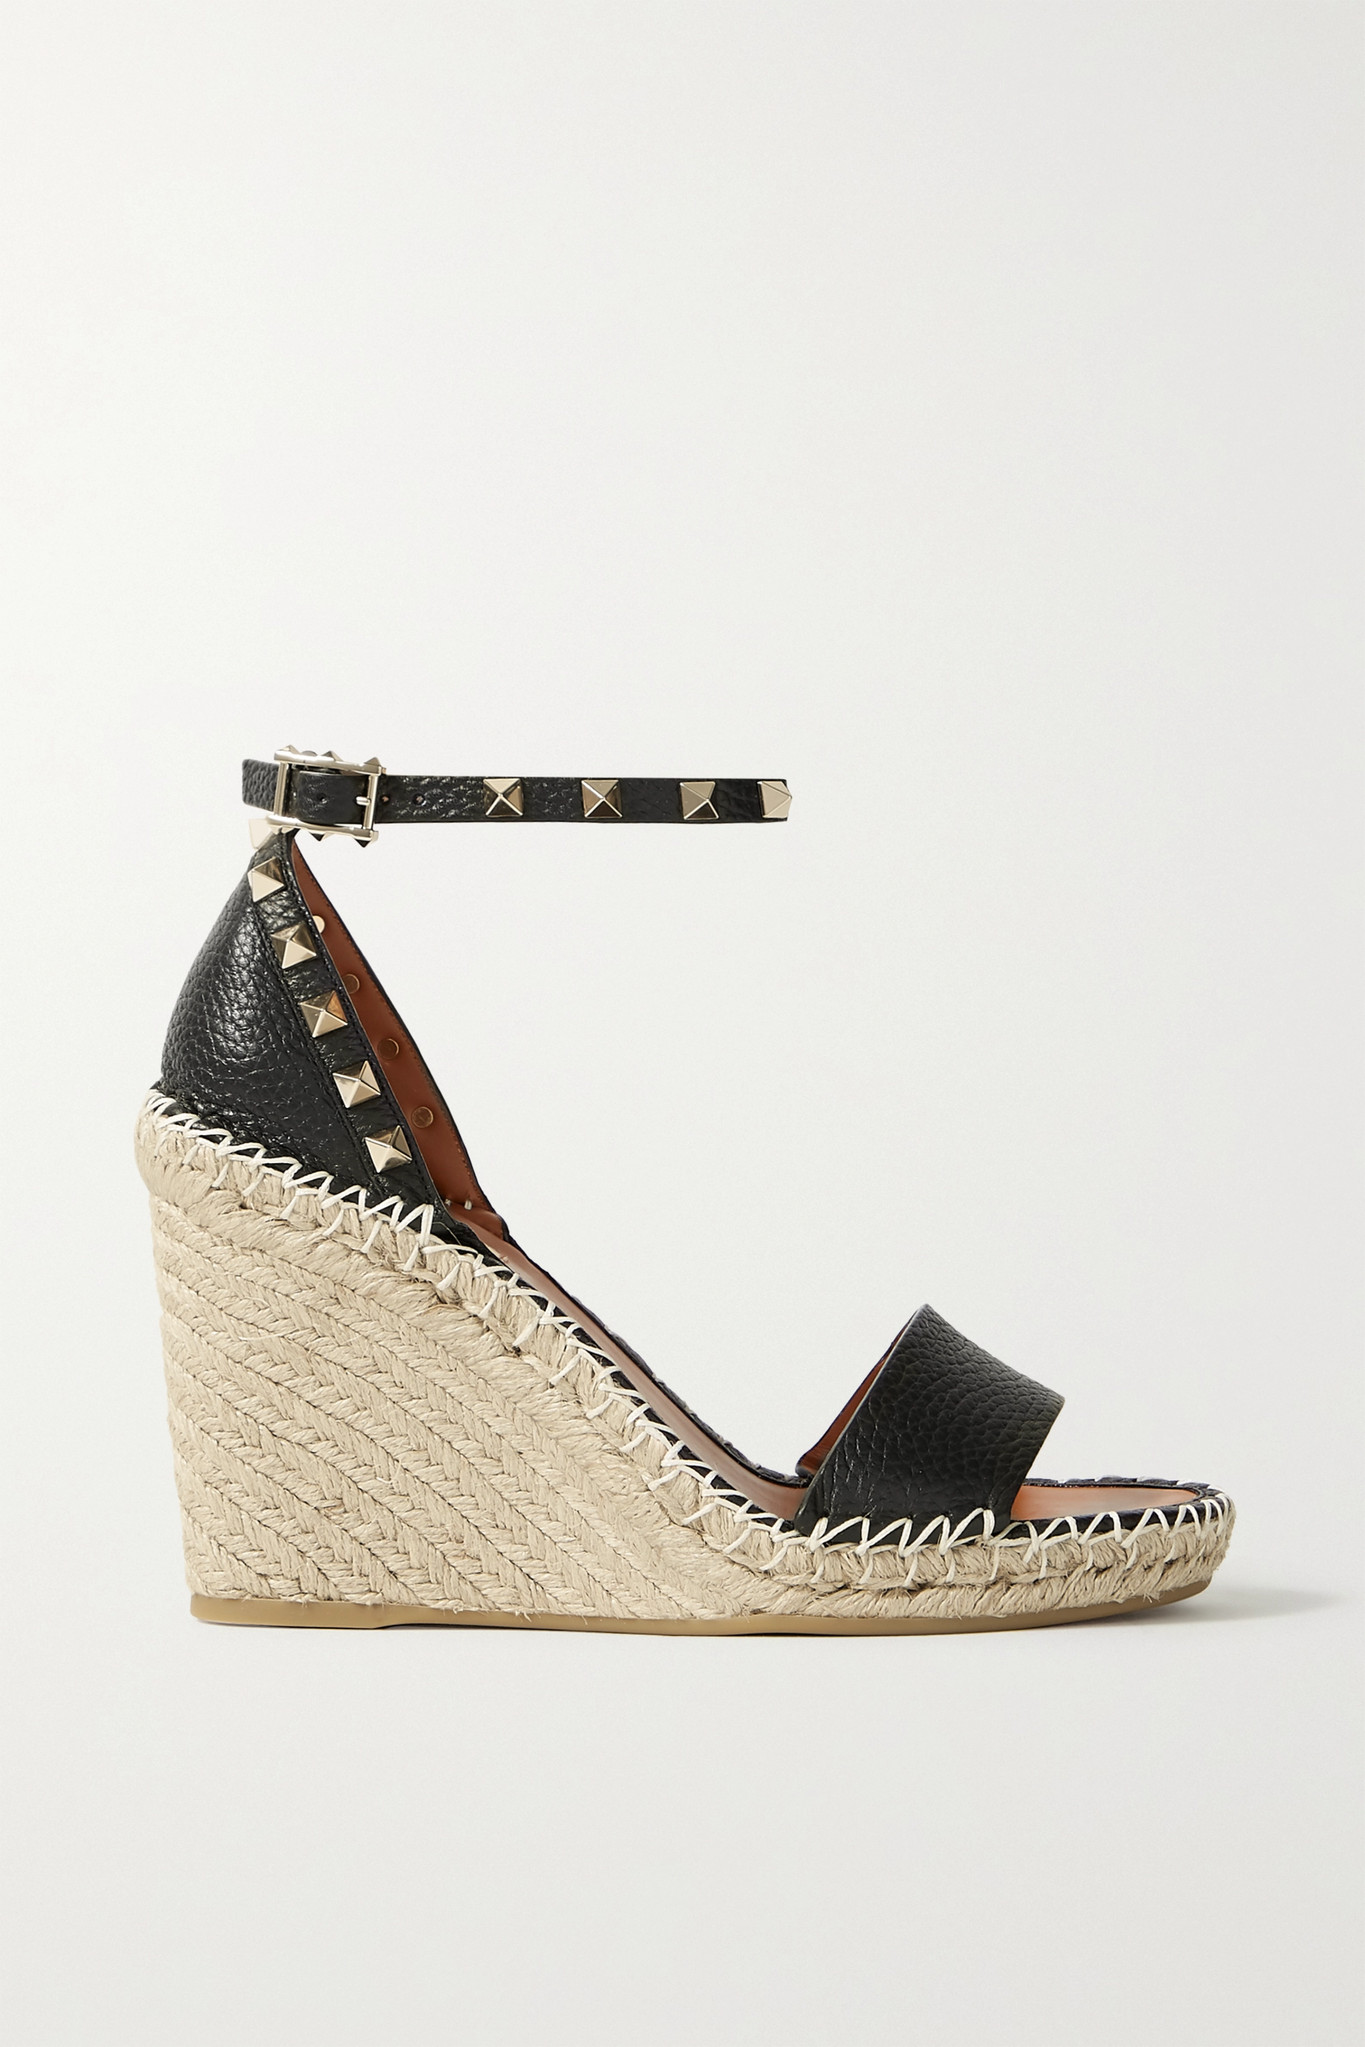 VALENTINO - Valentino Garavani Rockstud 105 Textured-leather Espadrille Wedge Sandals - Black - IT41